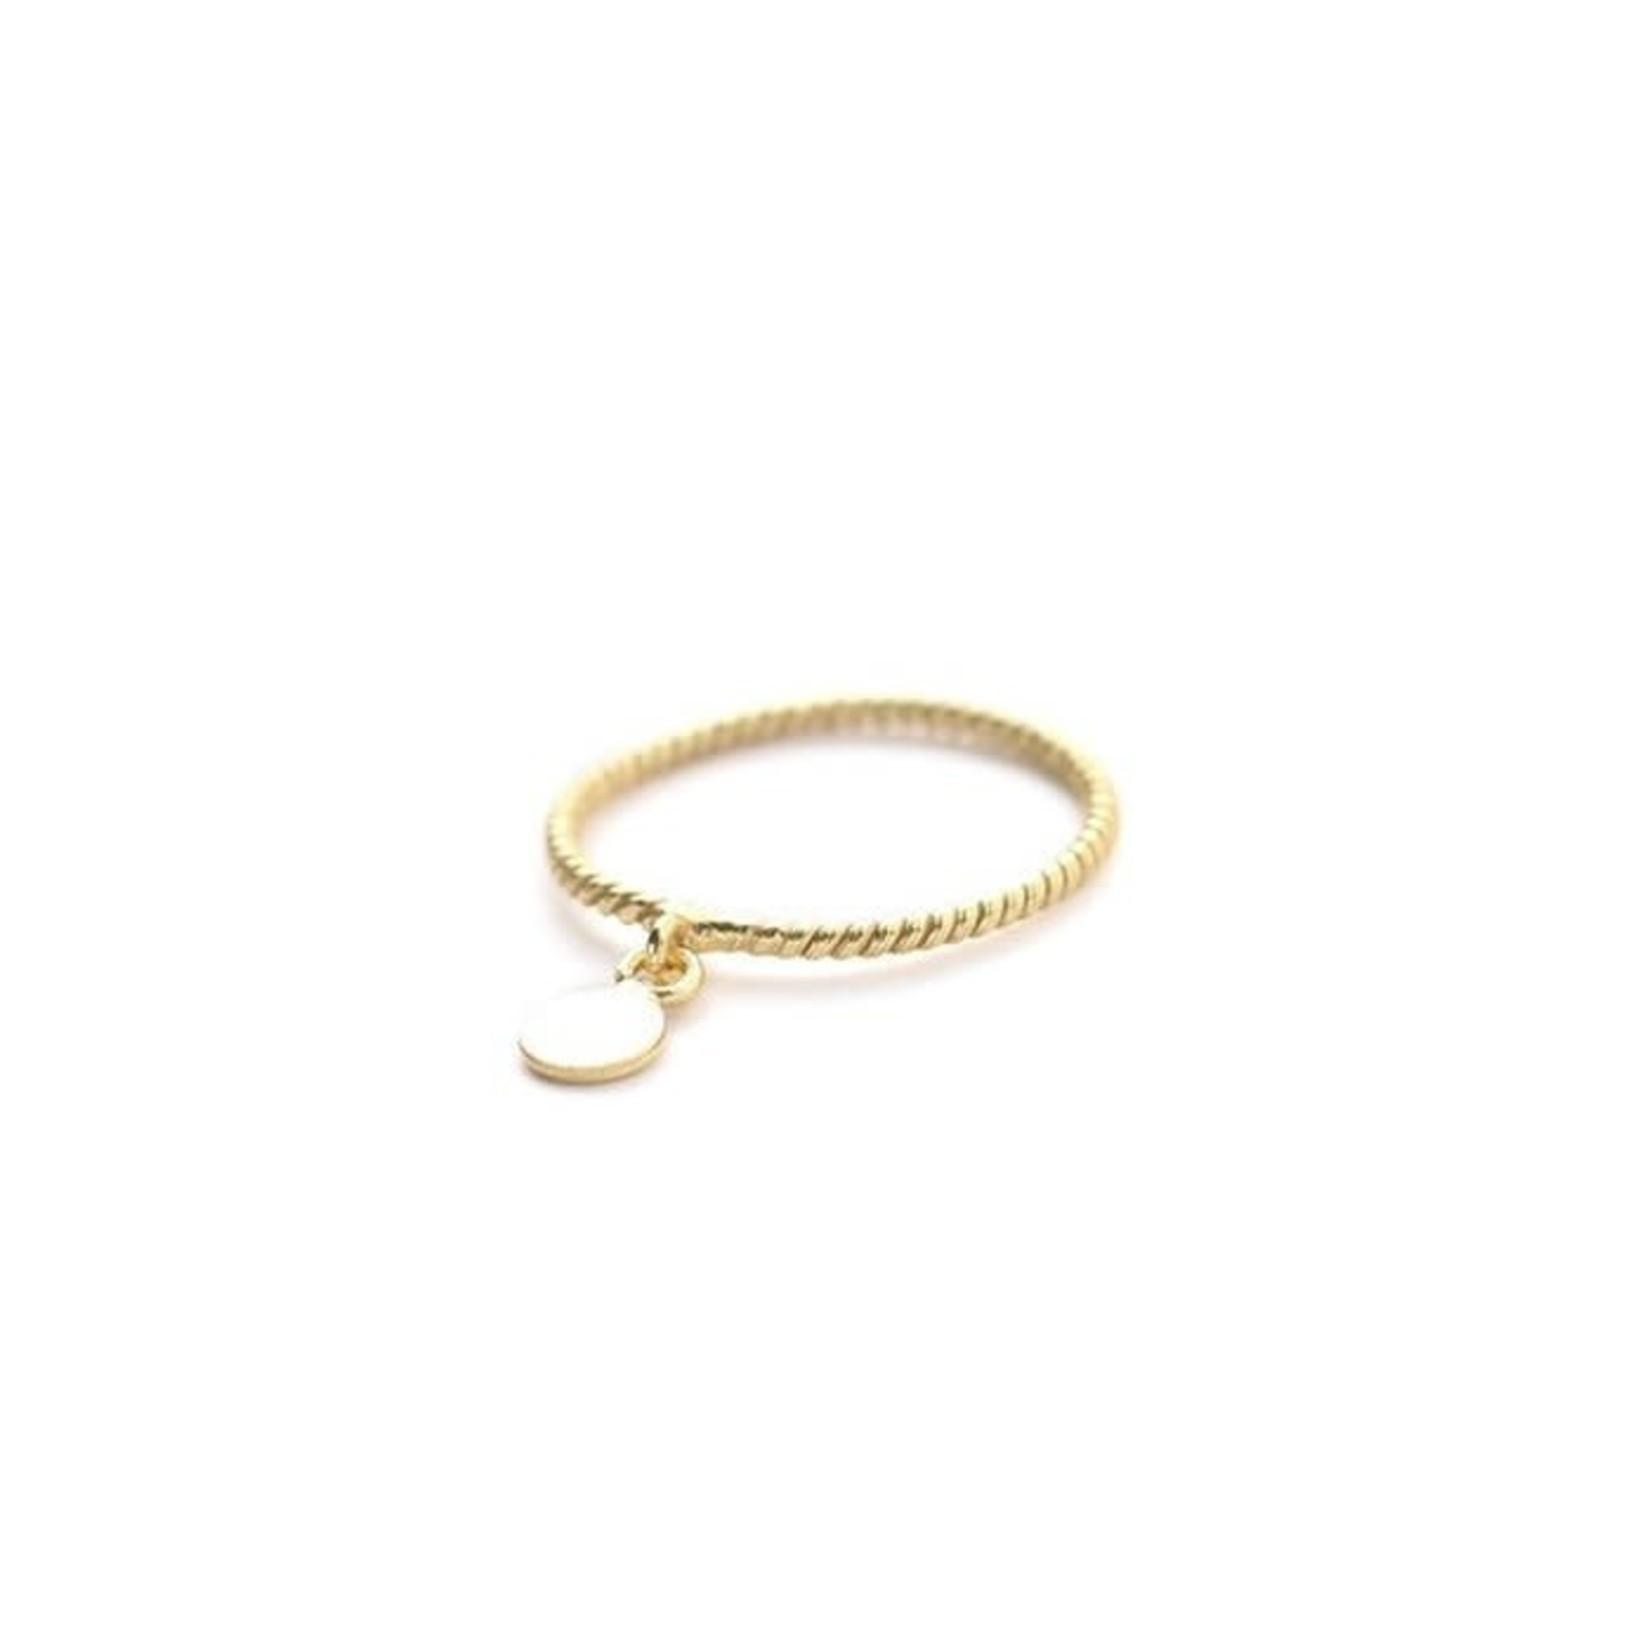 Muja Juma • fijne gouden ring met mini muntje